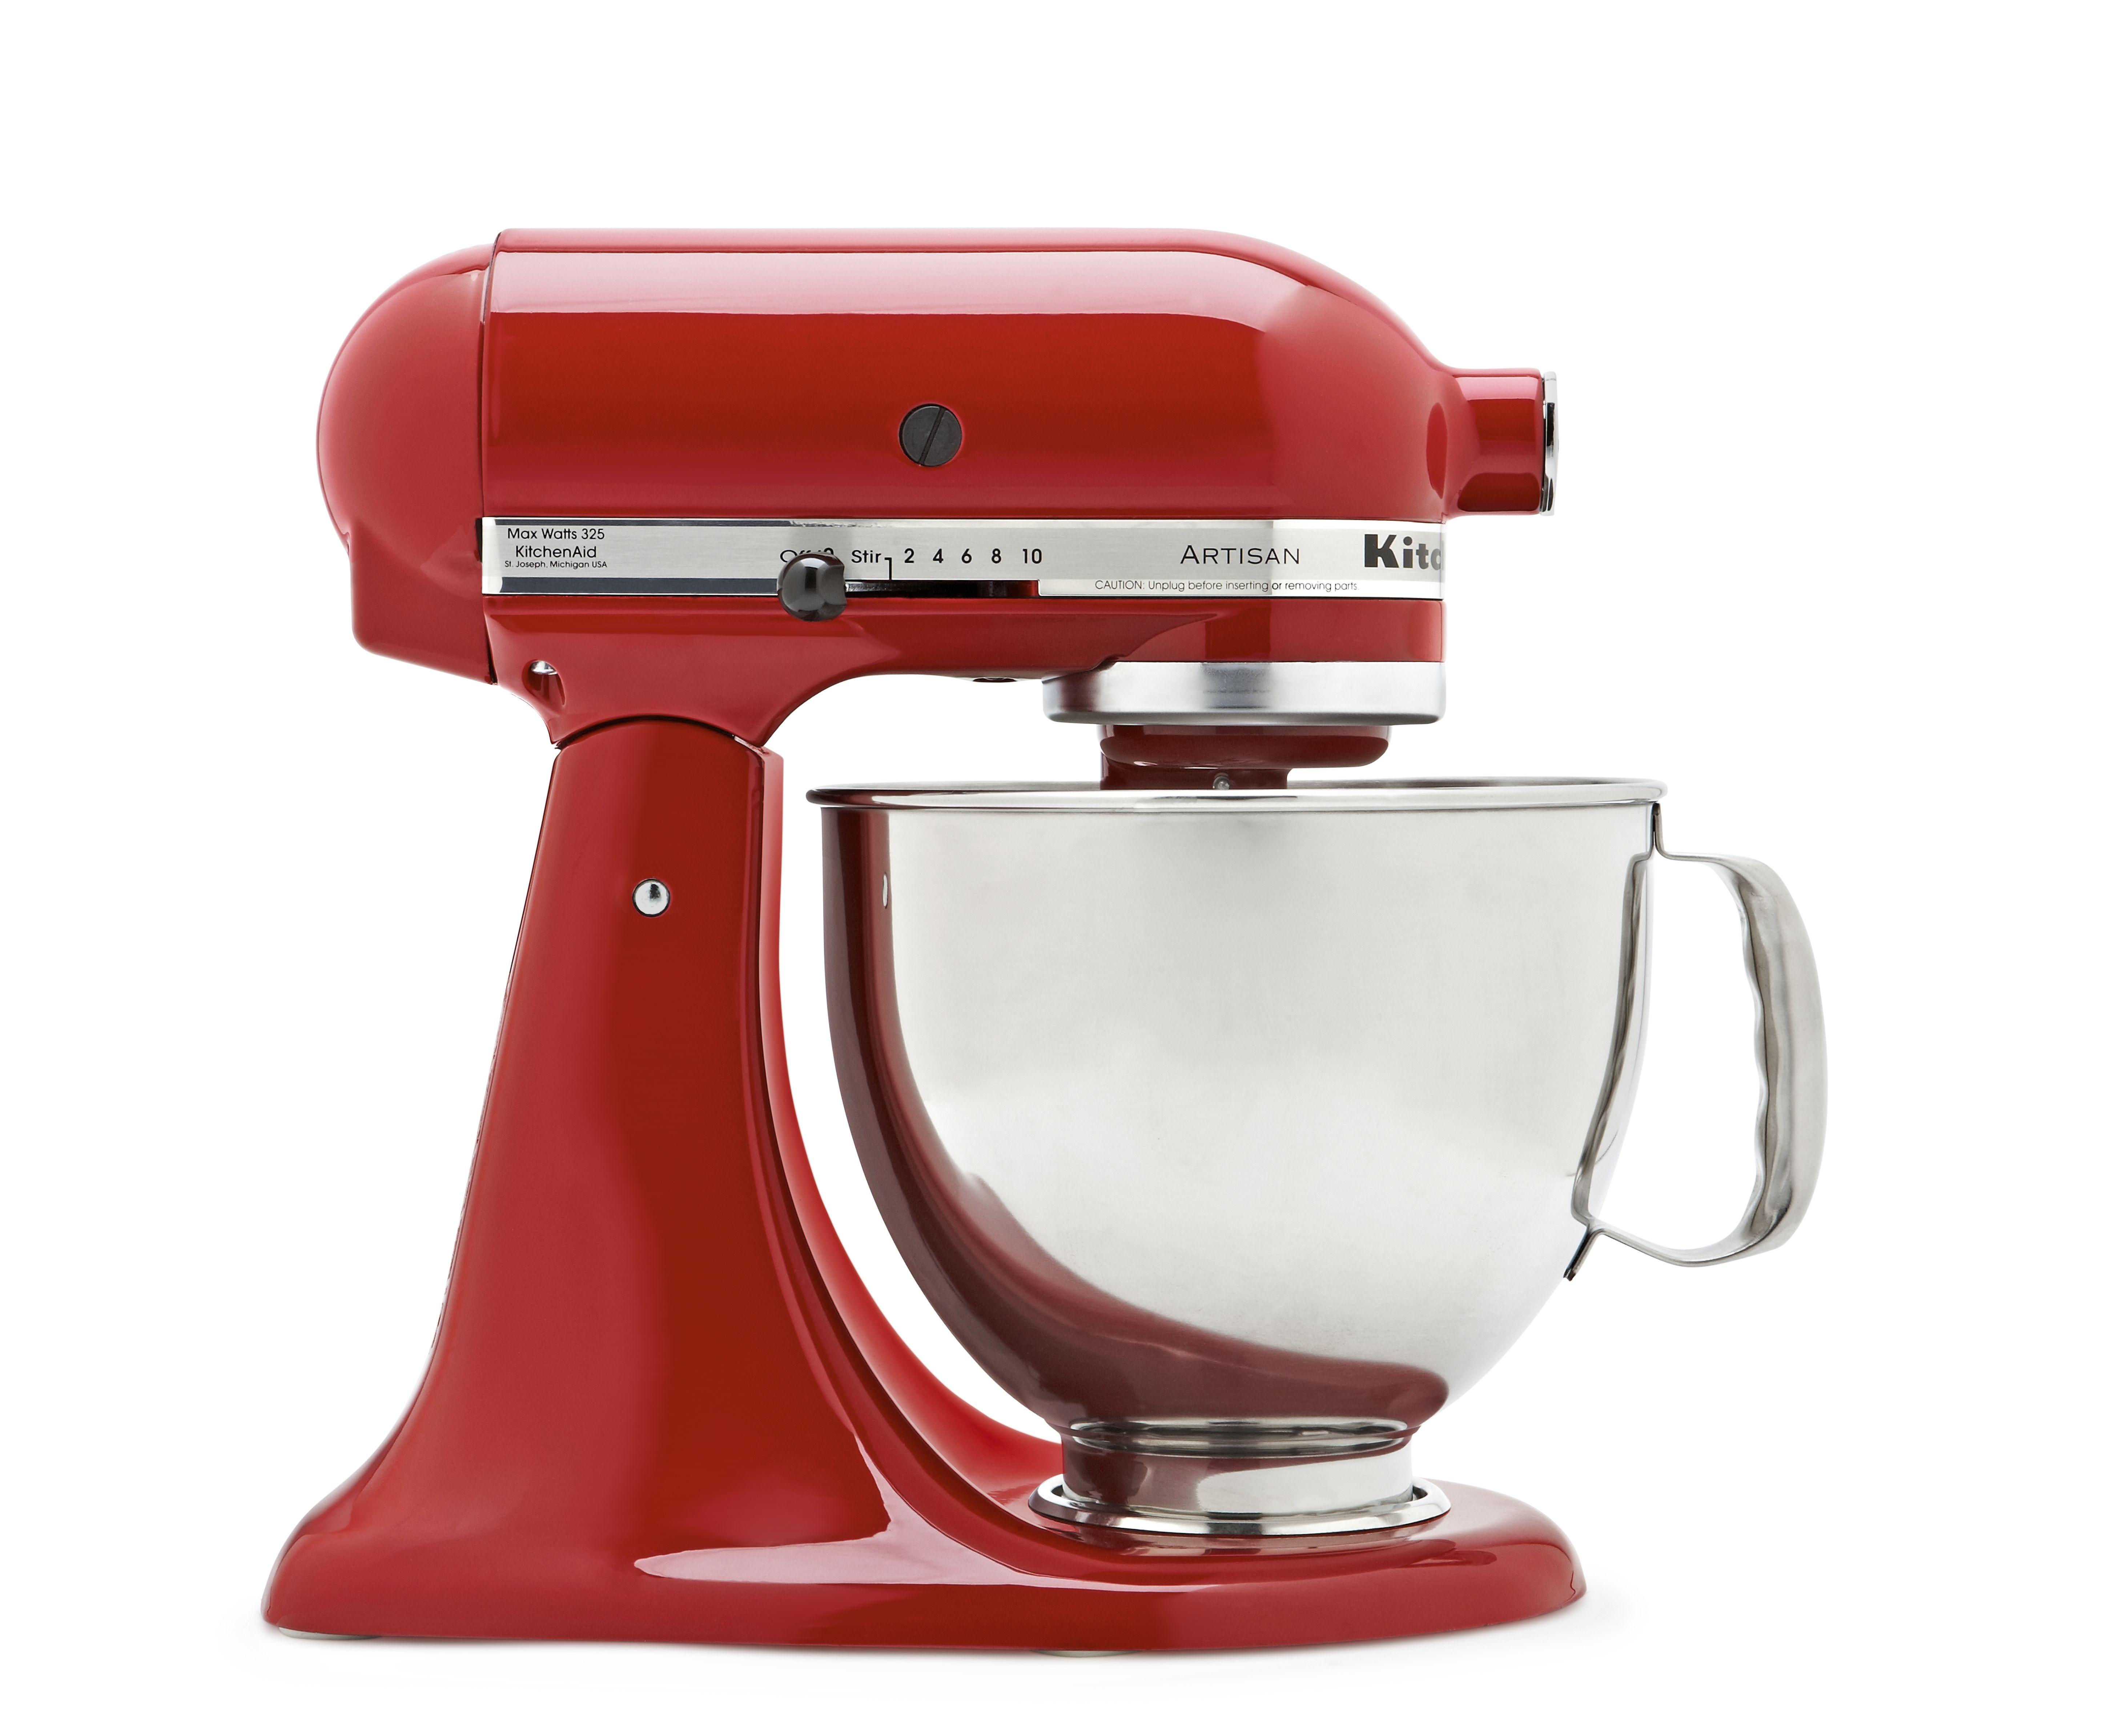 kitchenaid mixing bowl set red